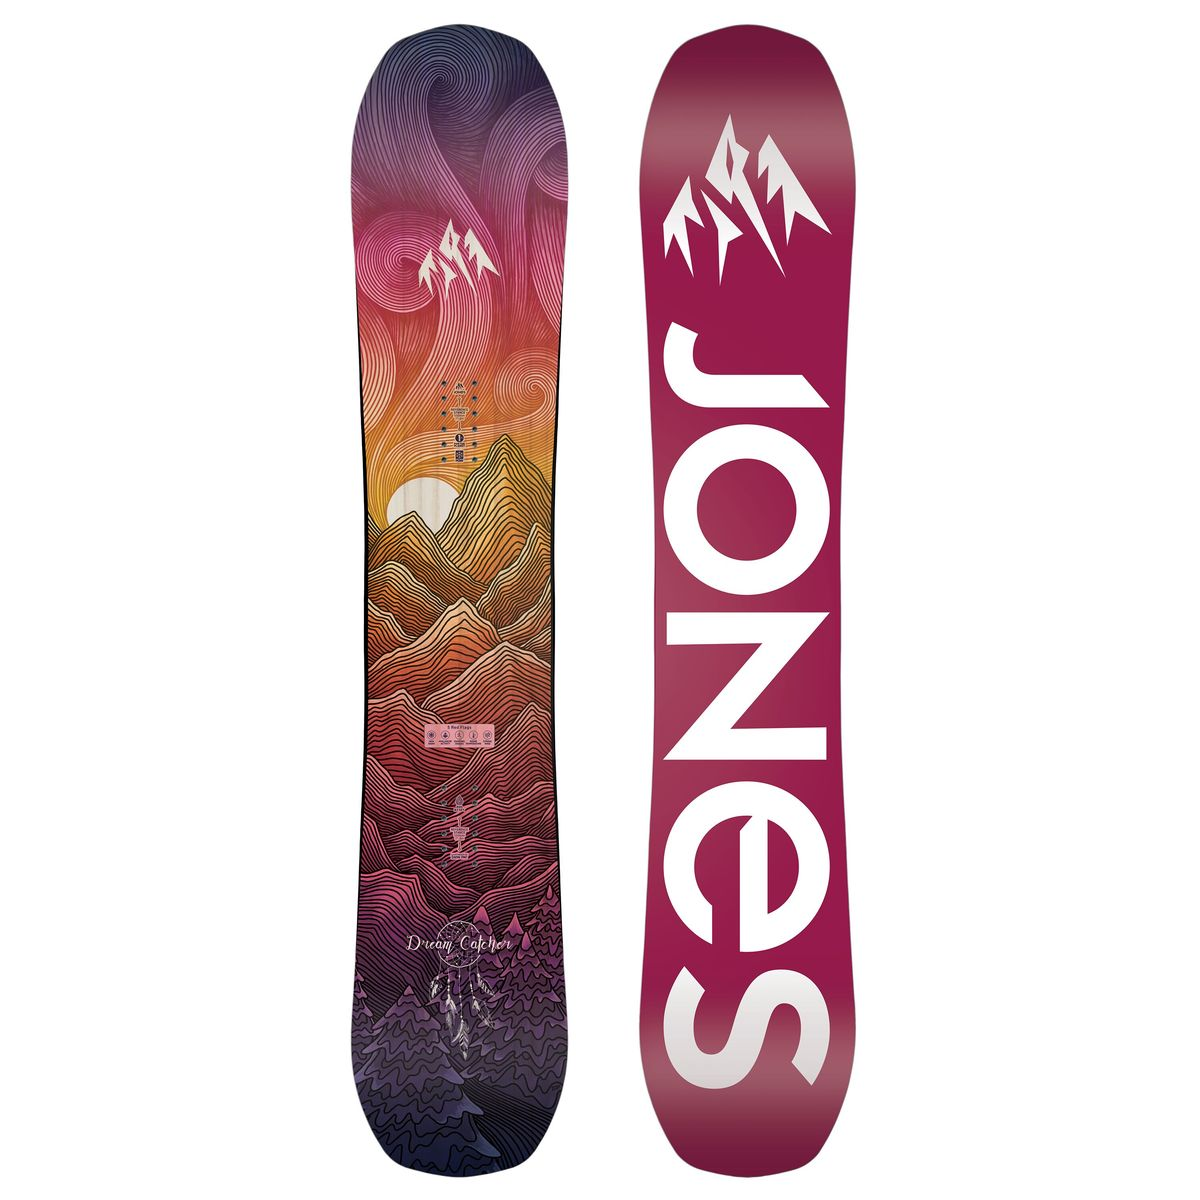 Placa snowboard femei Jones Dream Catcher 20/21 imagine